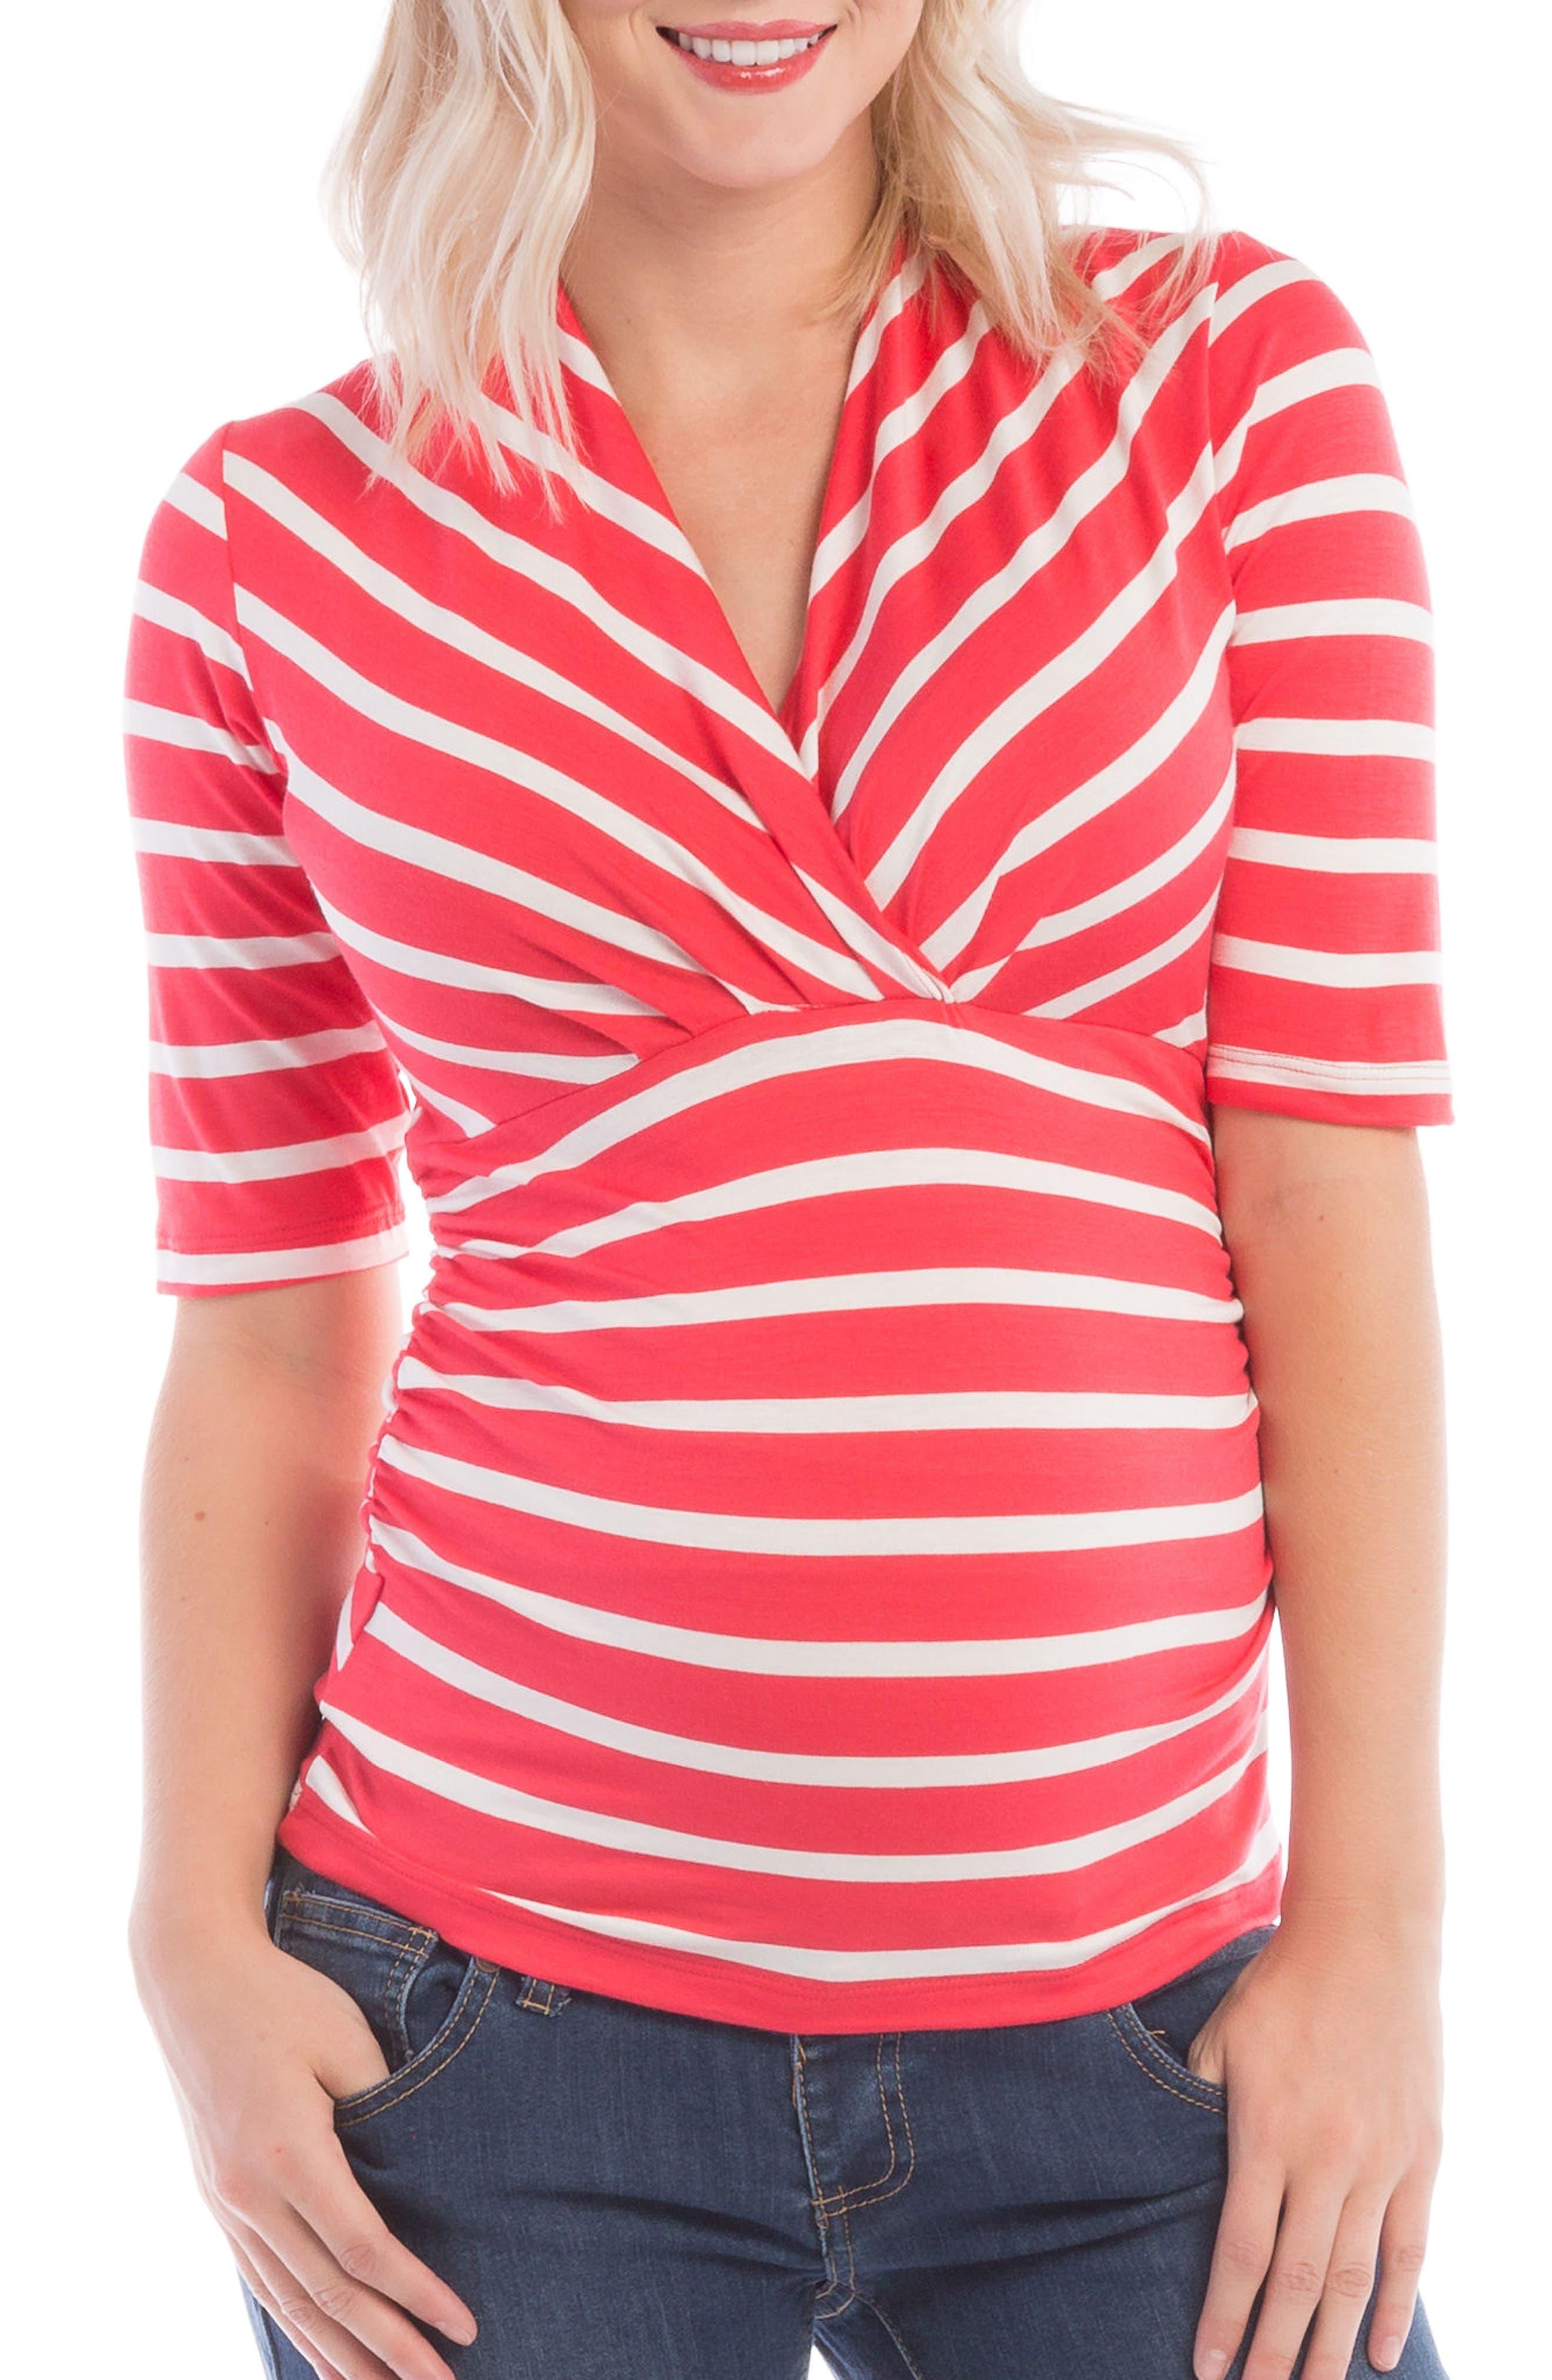 Main Image - Lilac Clothing Megan Maternity/Nursing Top